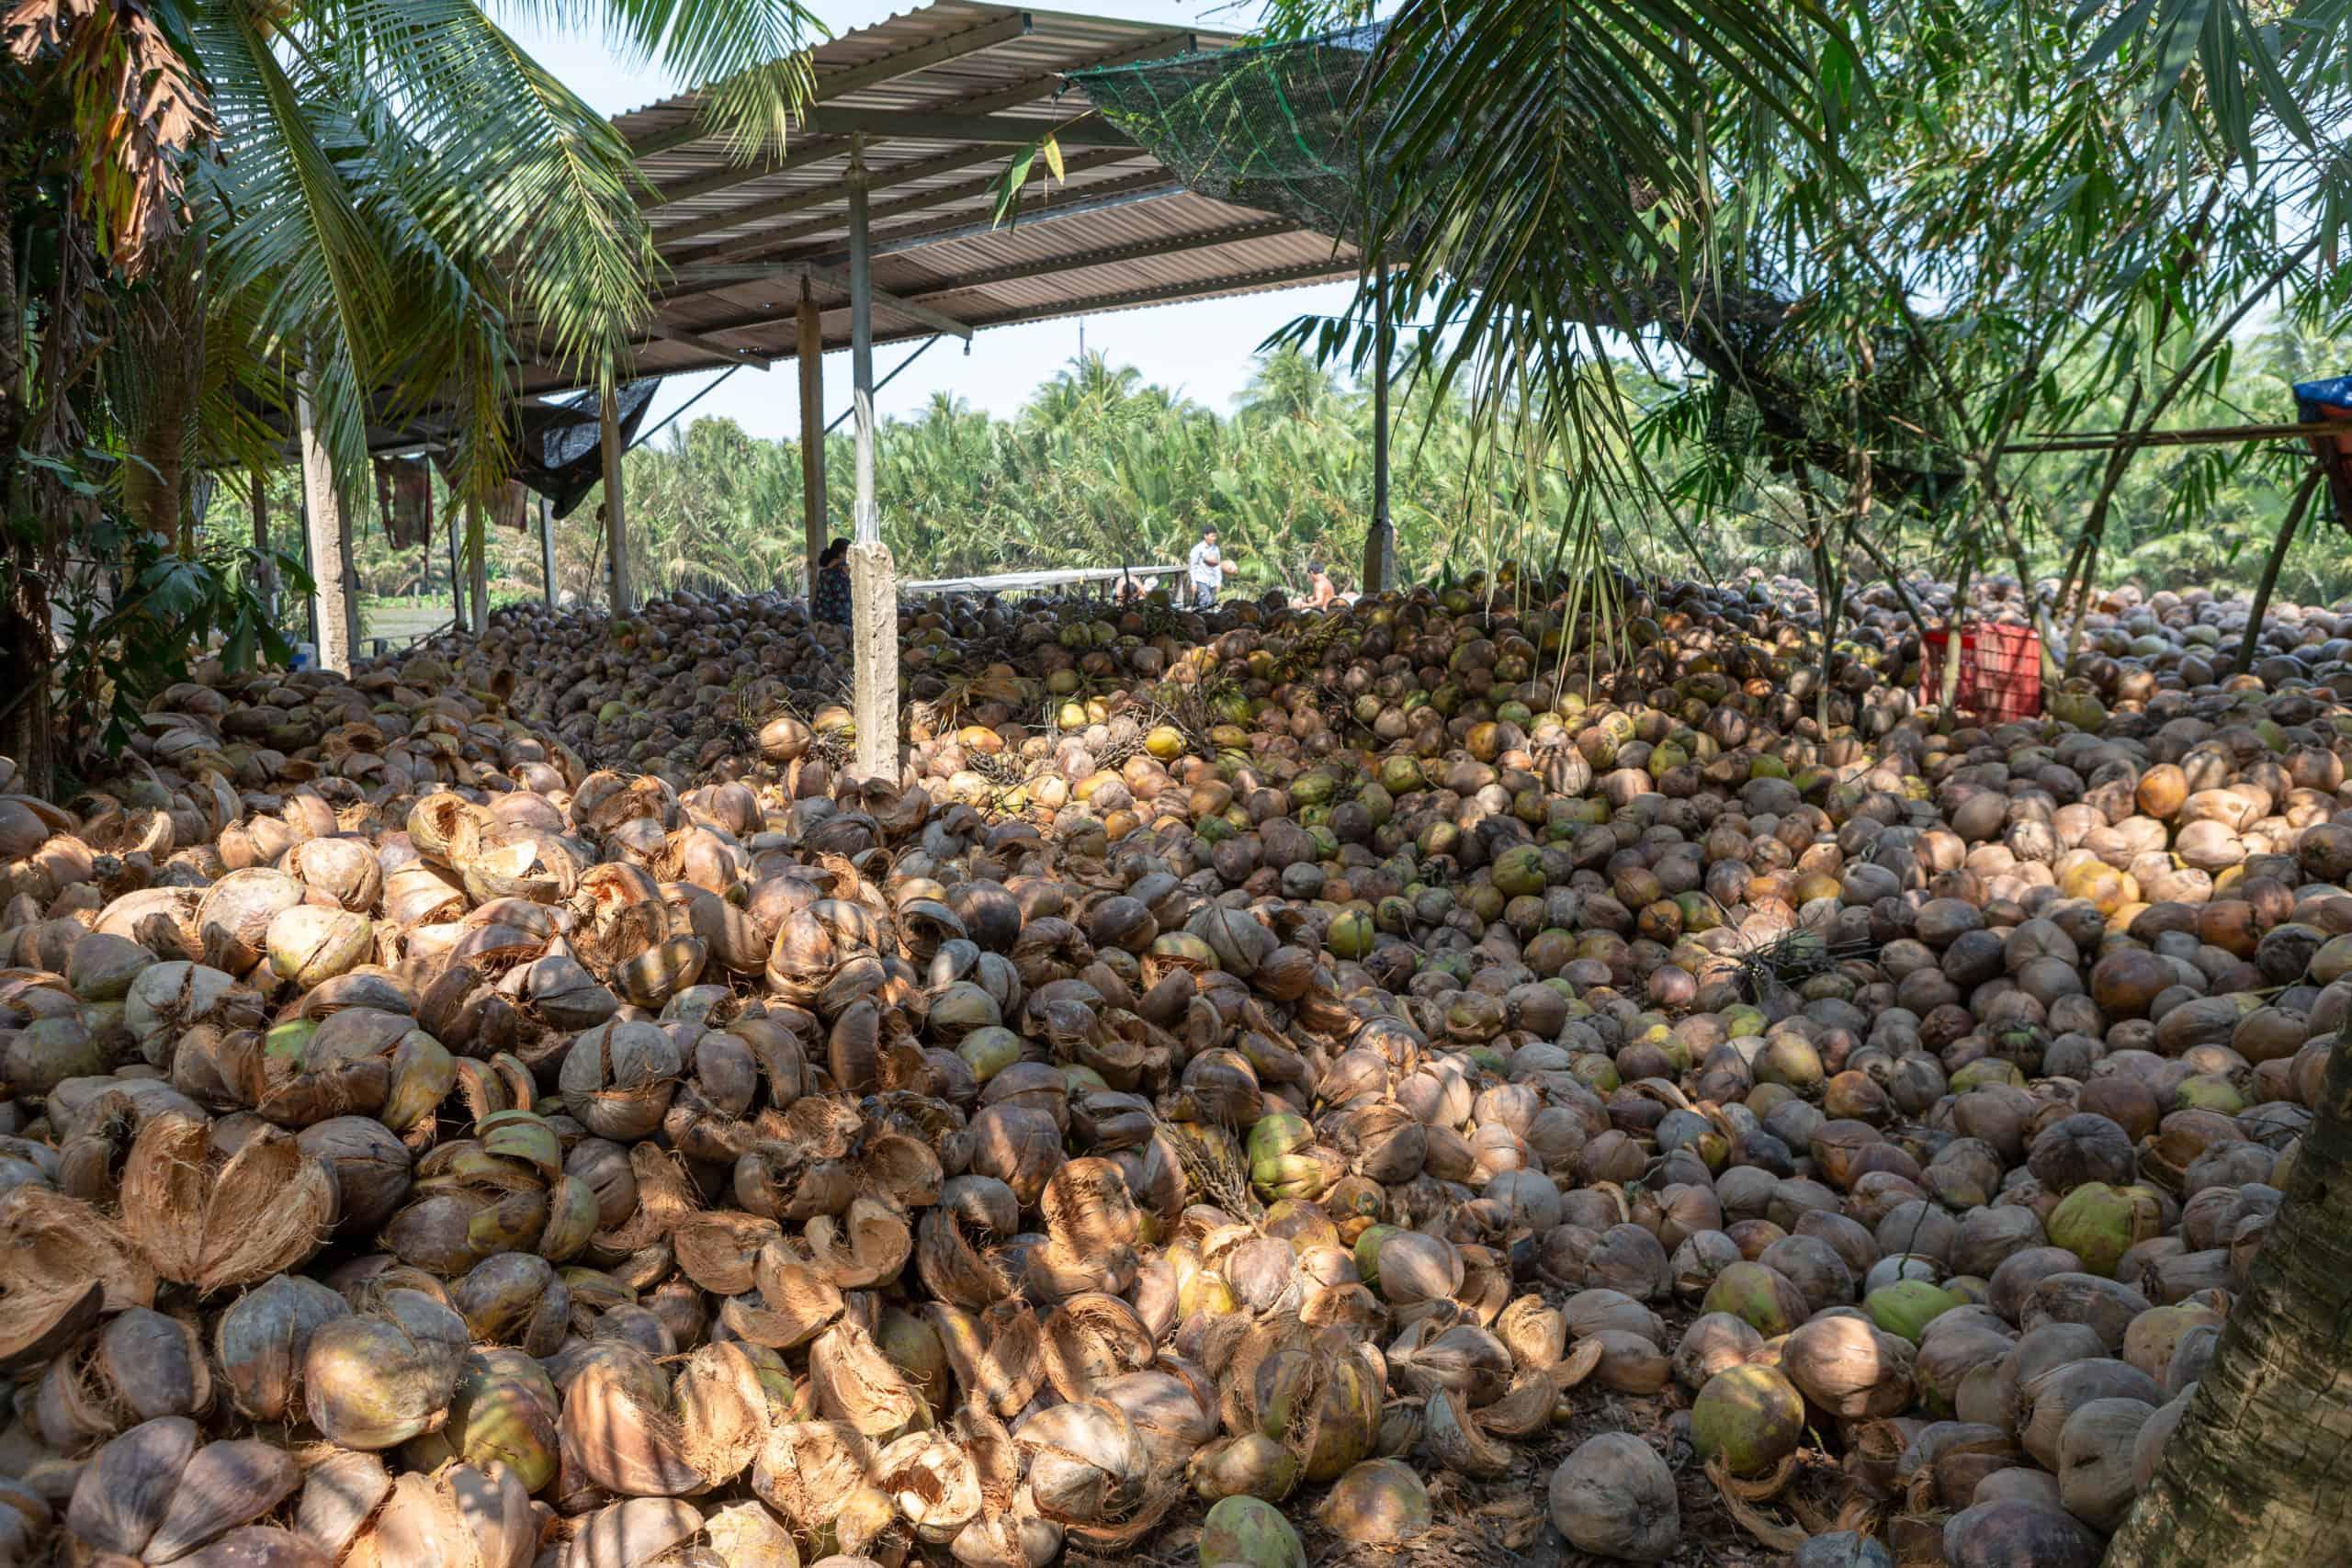 Coconut candy lady Co Tu Ha